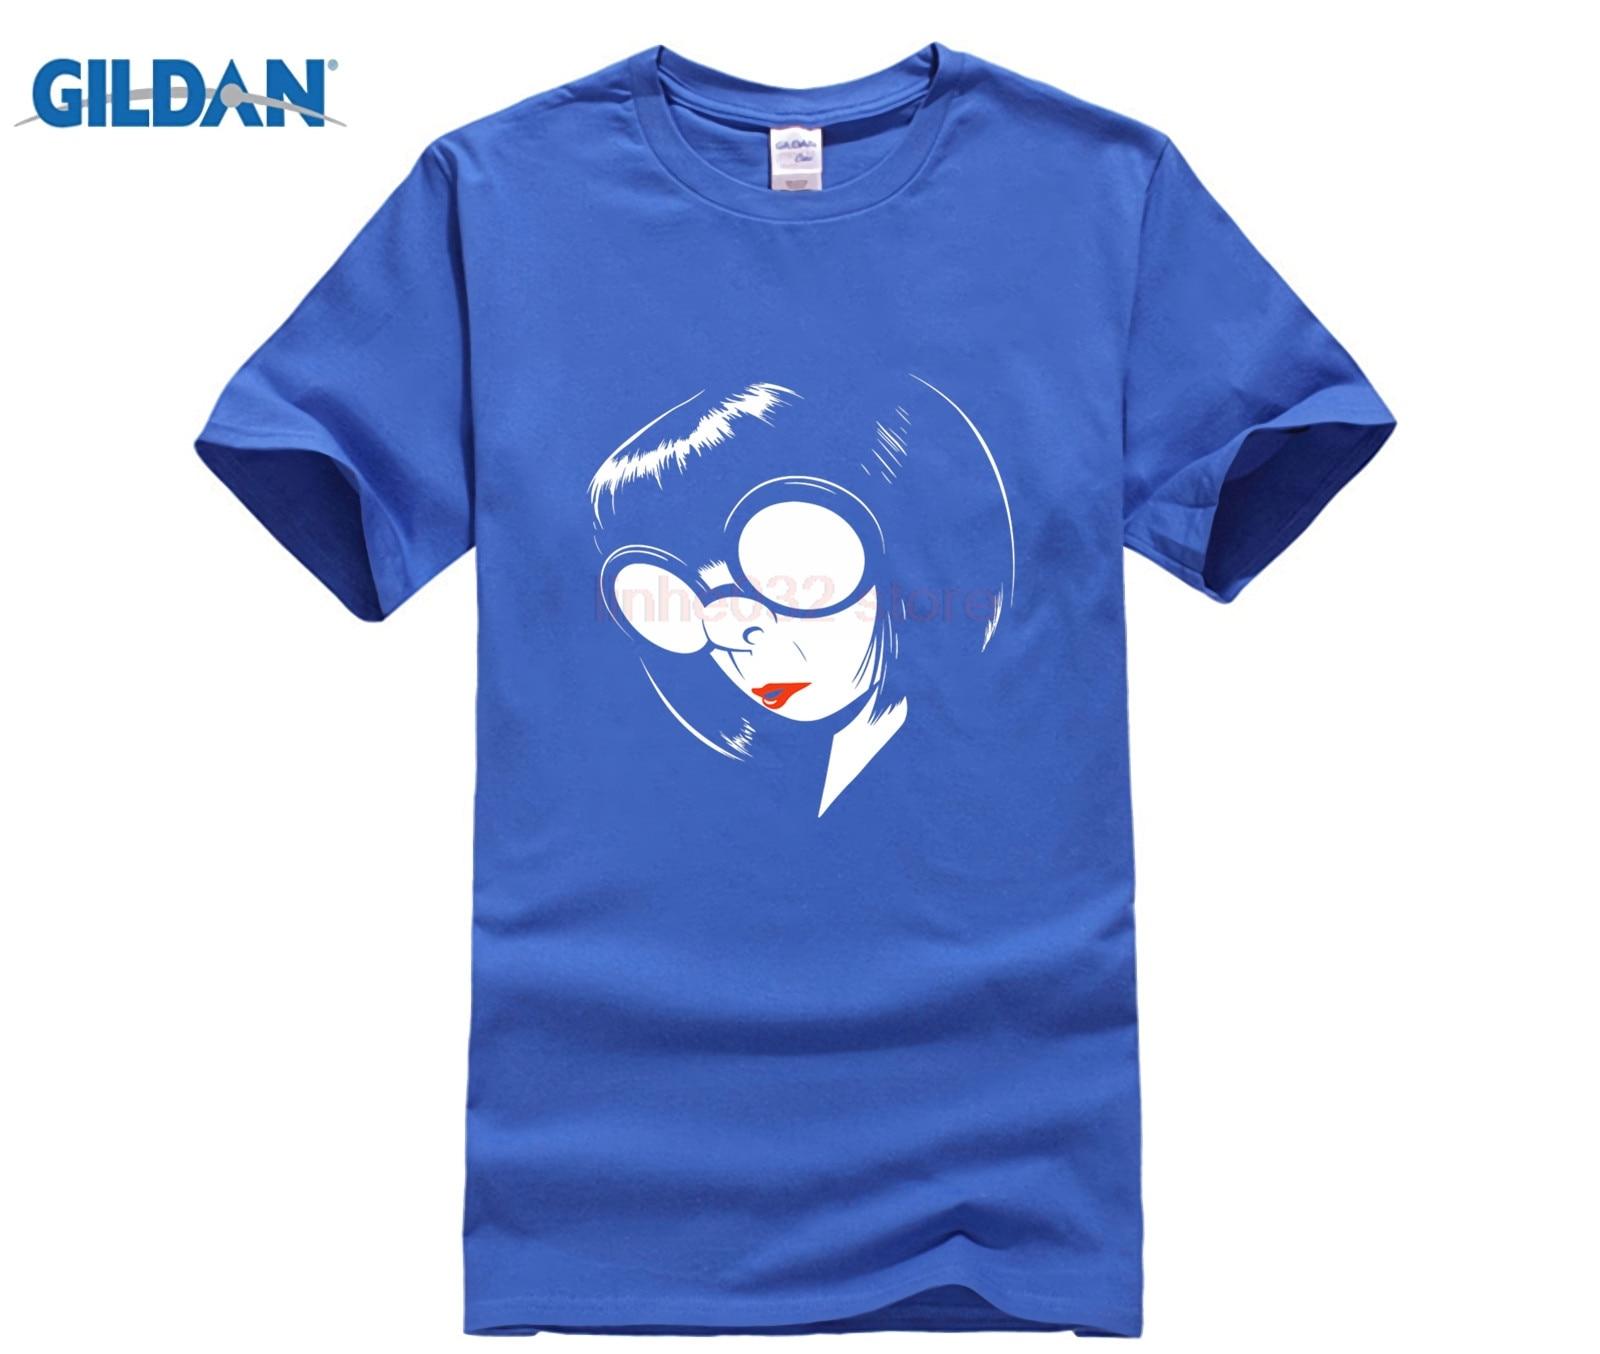 c933689c NEW SHIRT Edna Mode Incredibles 2 T Shirt Men's Harajuku T shirt-in ...